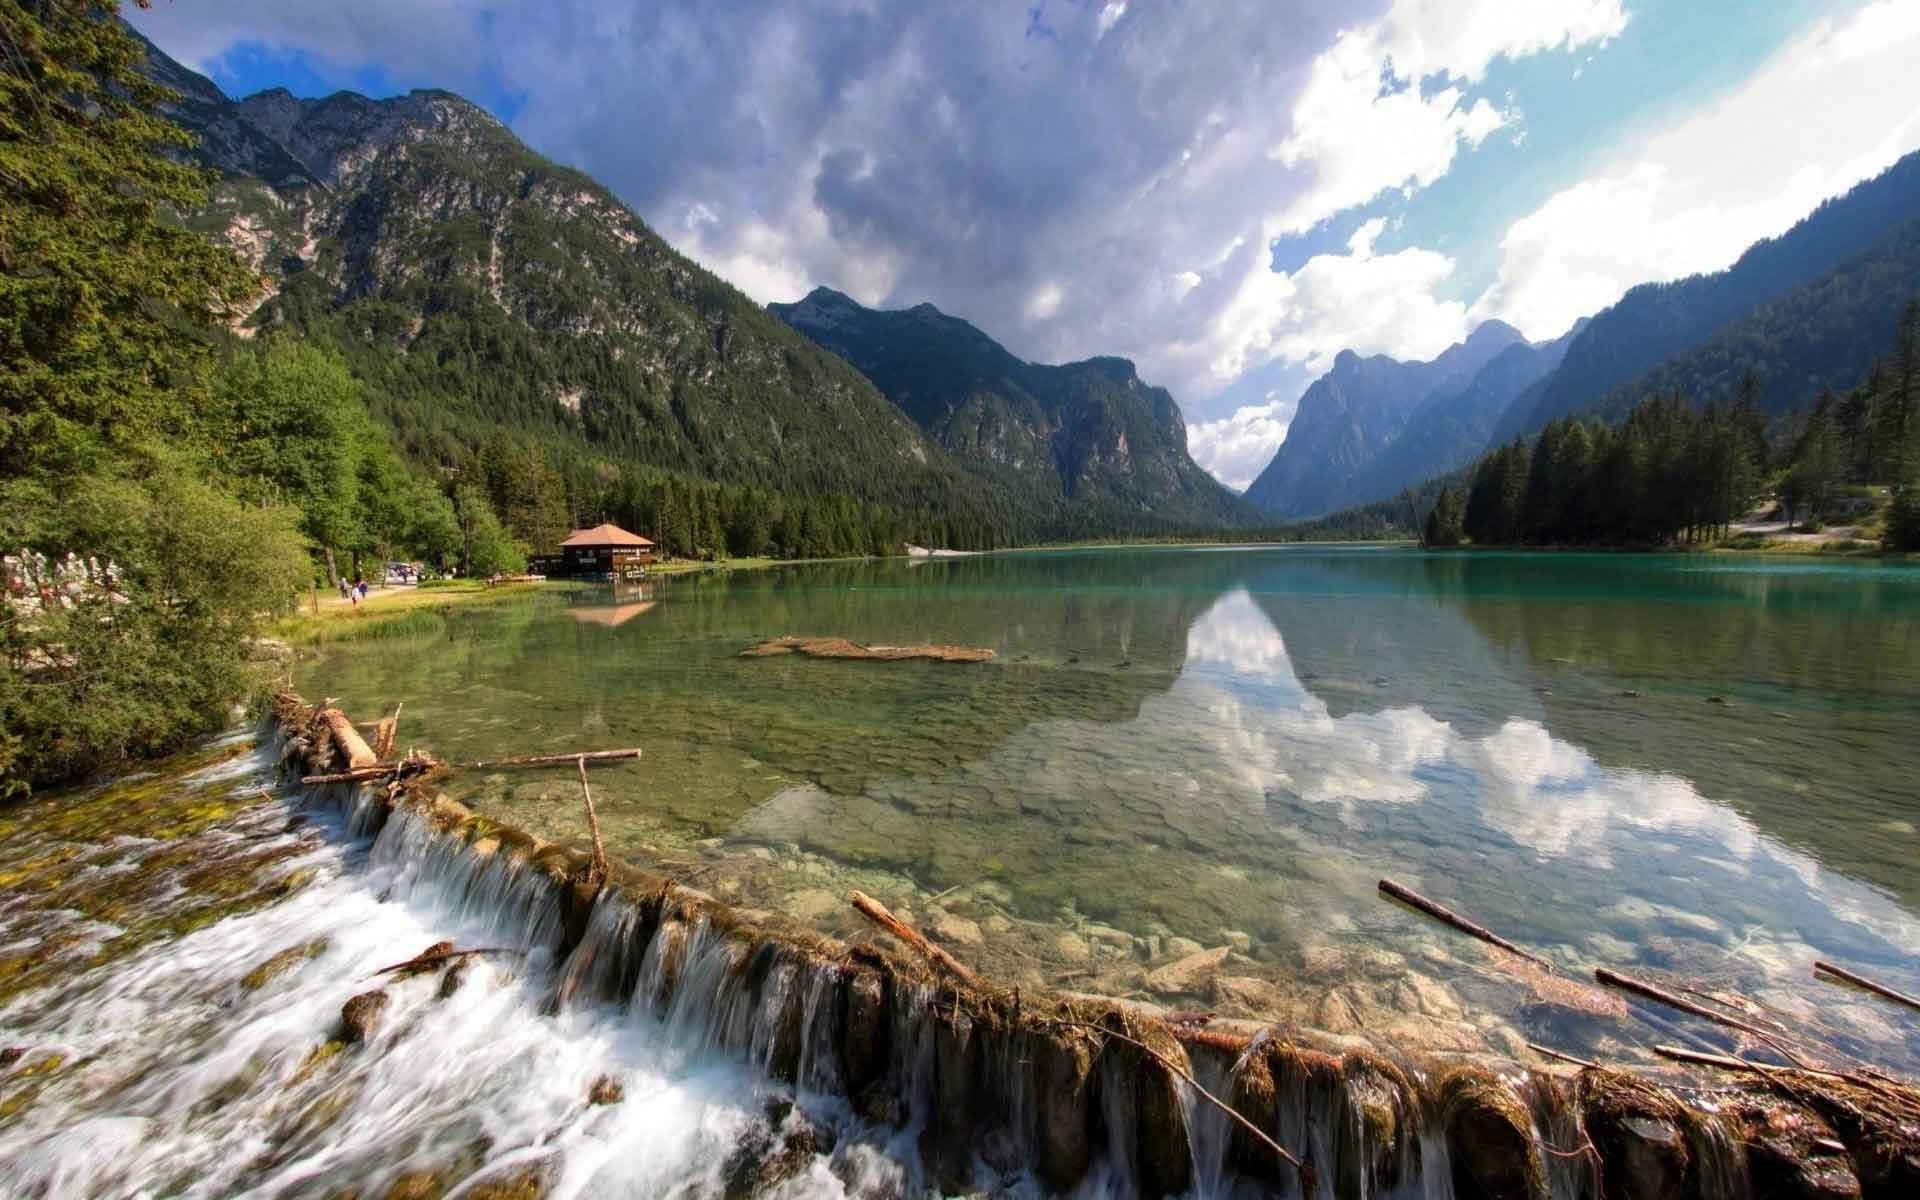 1920x1200 Lakes Lake House Stones Landscape Wood Mountains Cool Nature Desktop Backgrounds